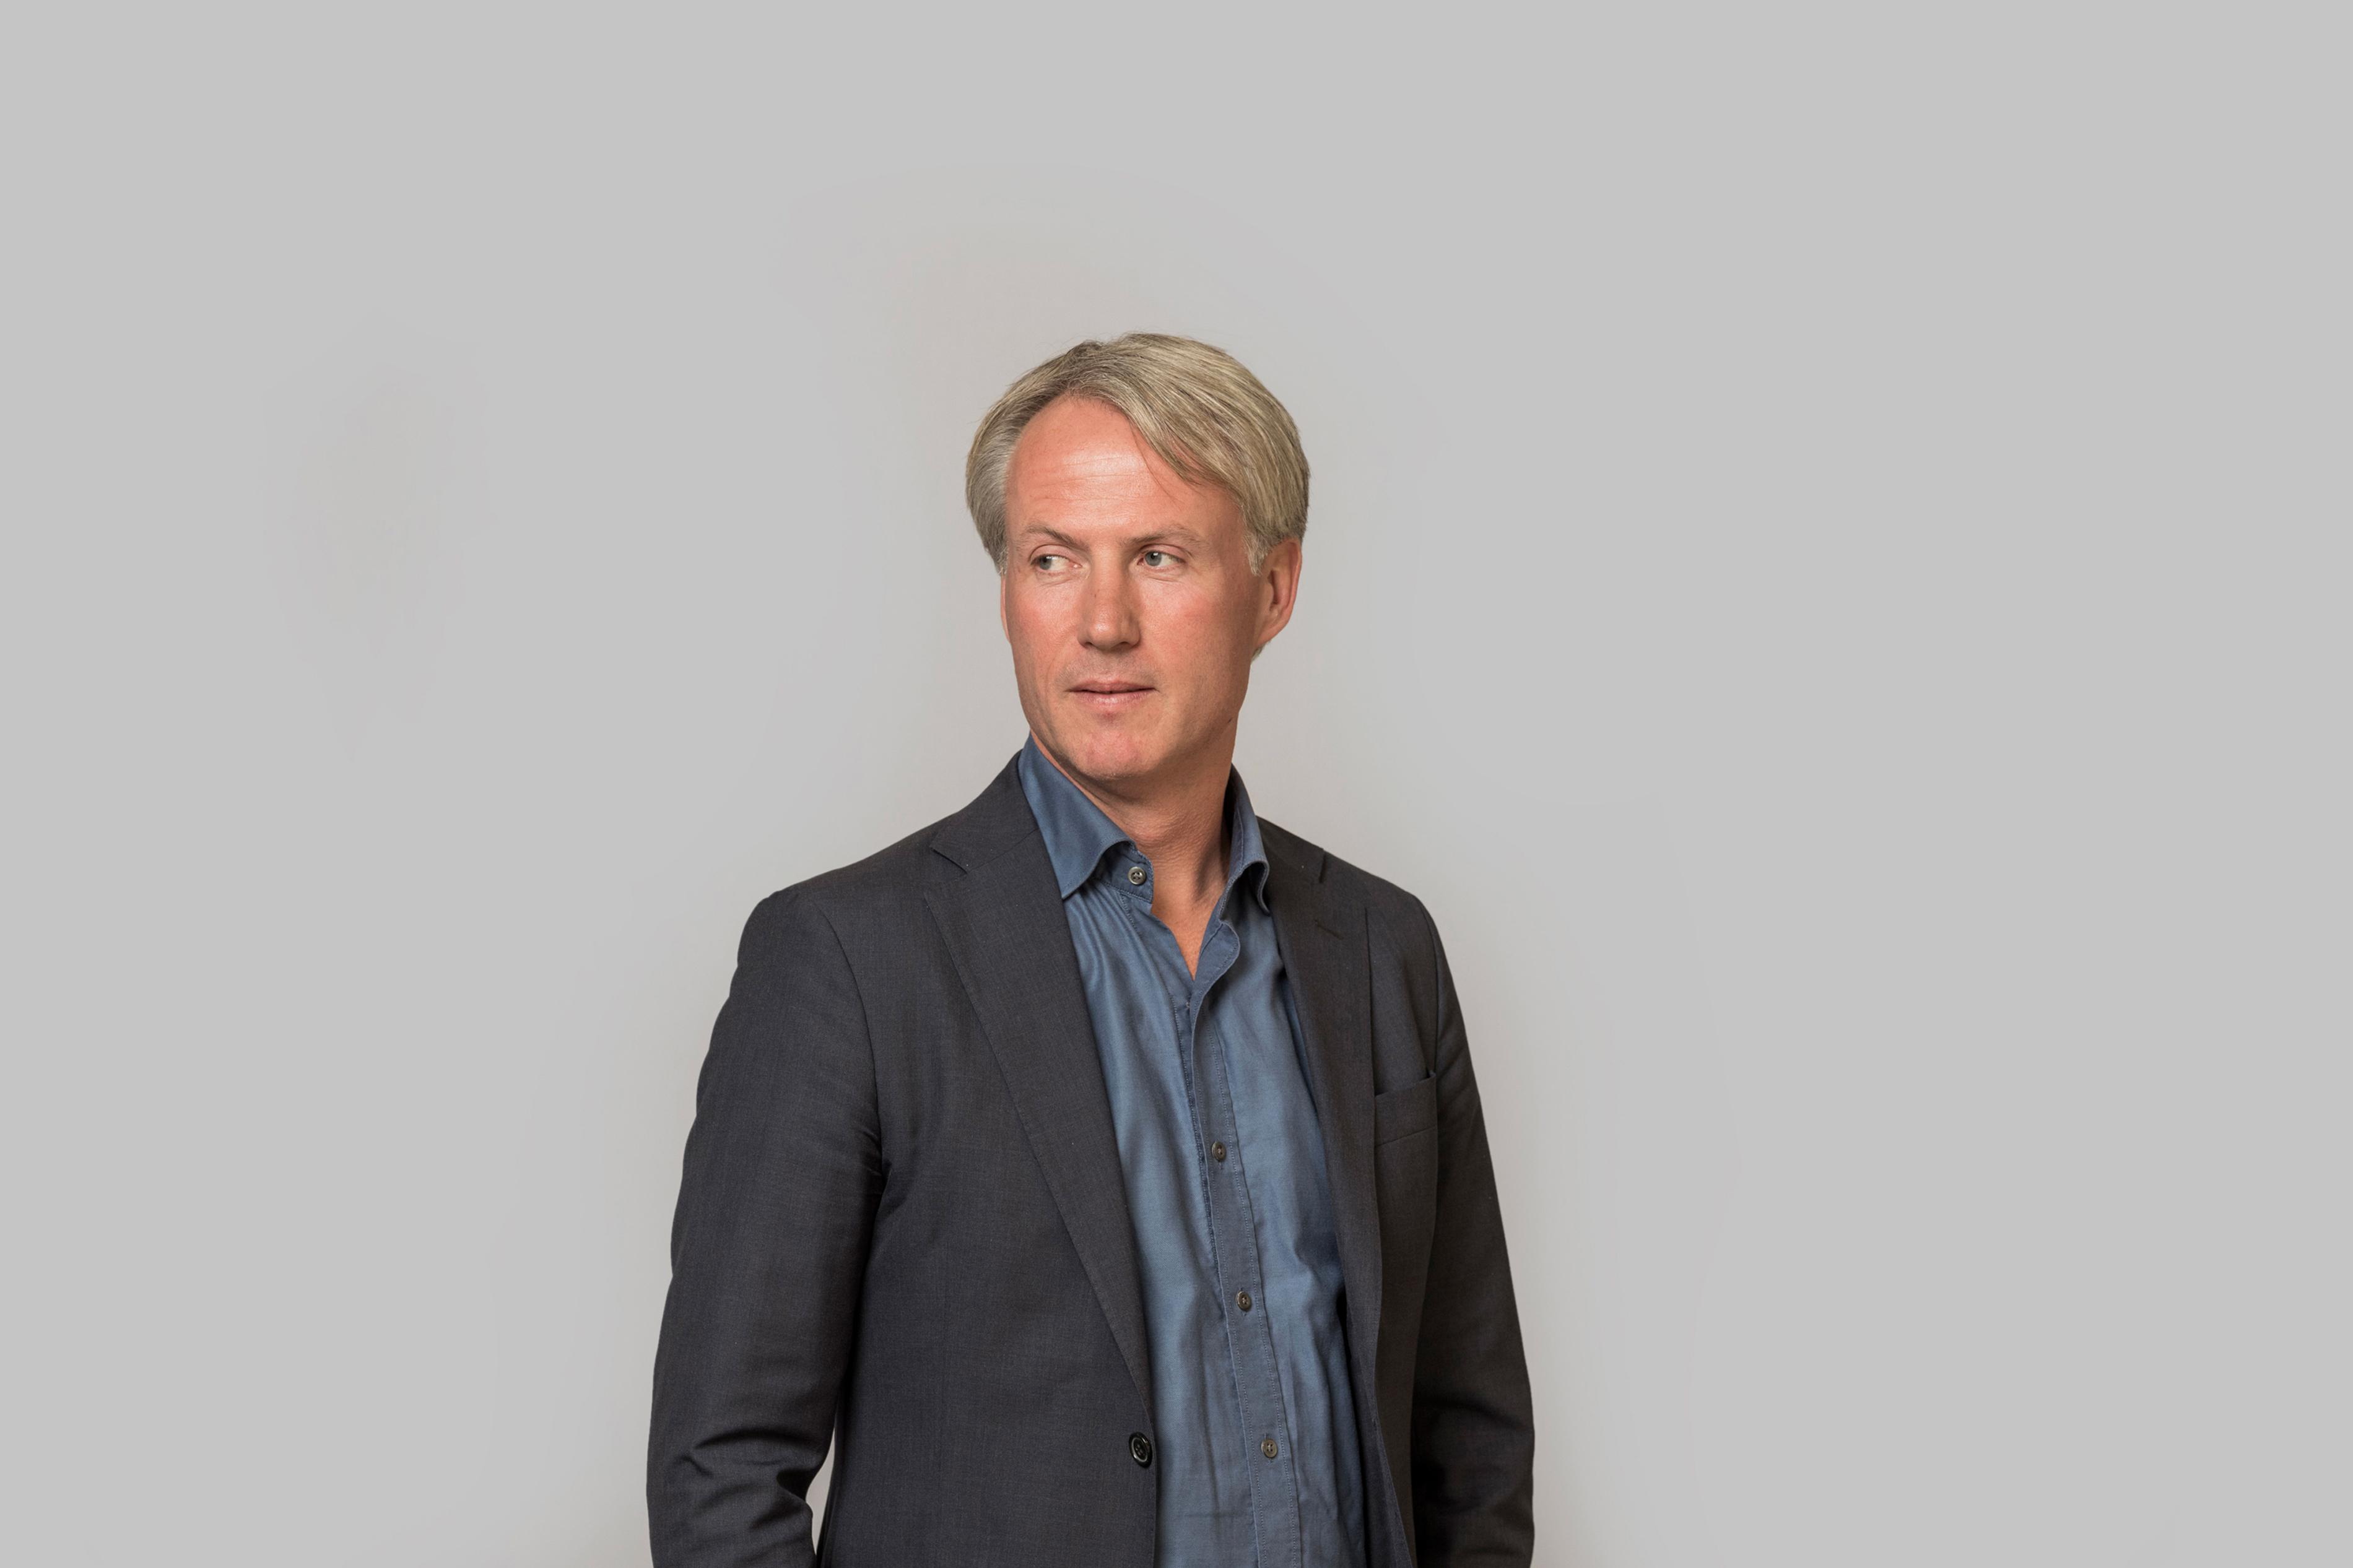 Richard Helgesson